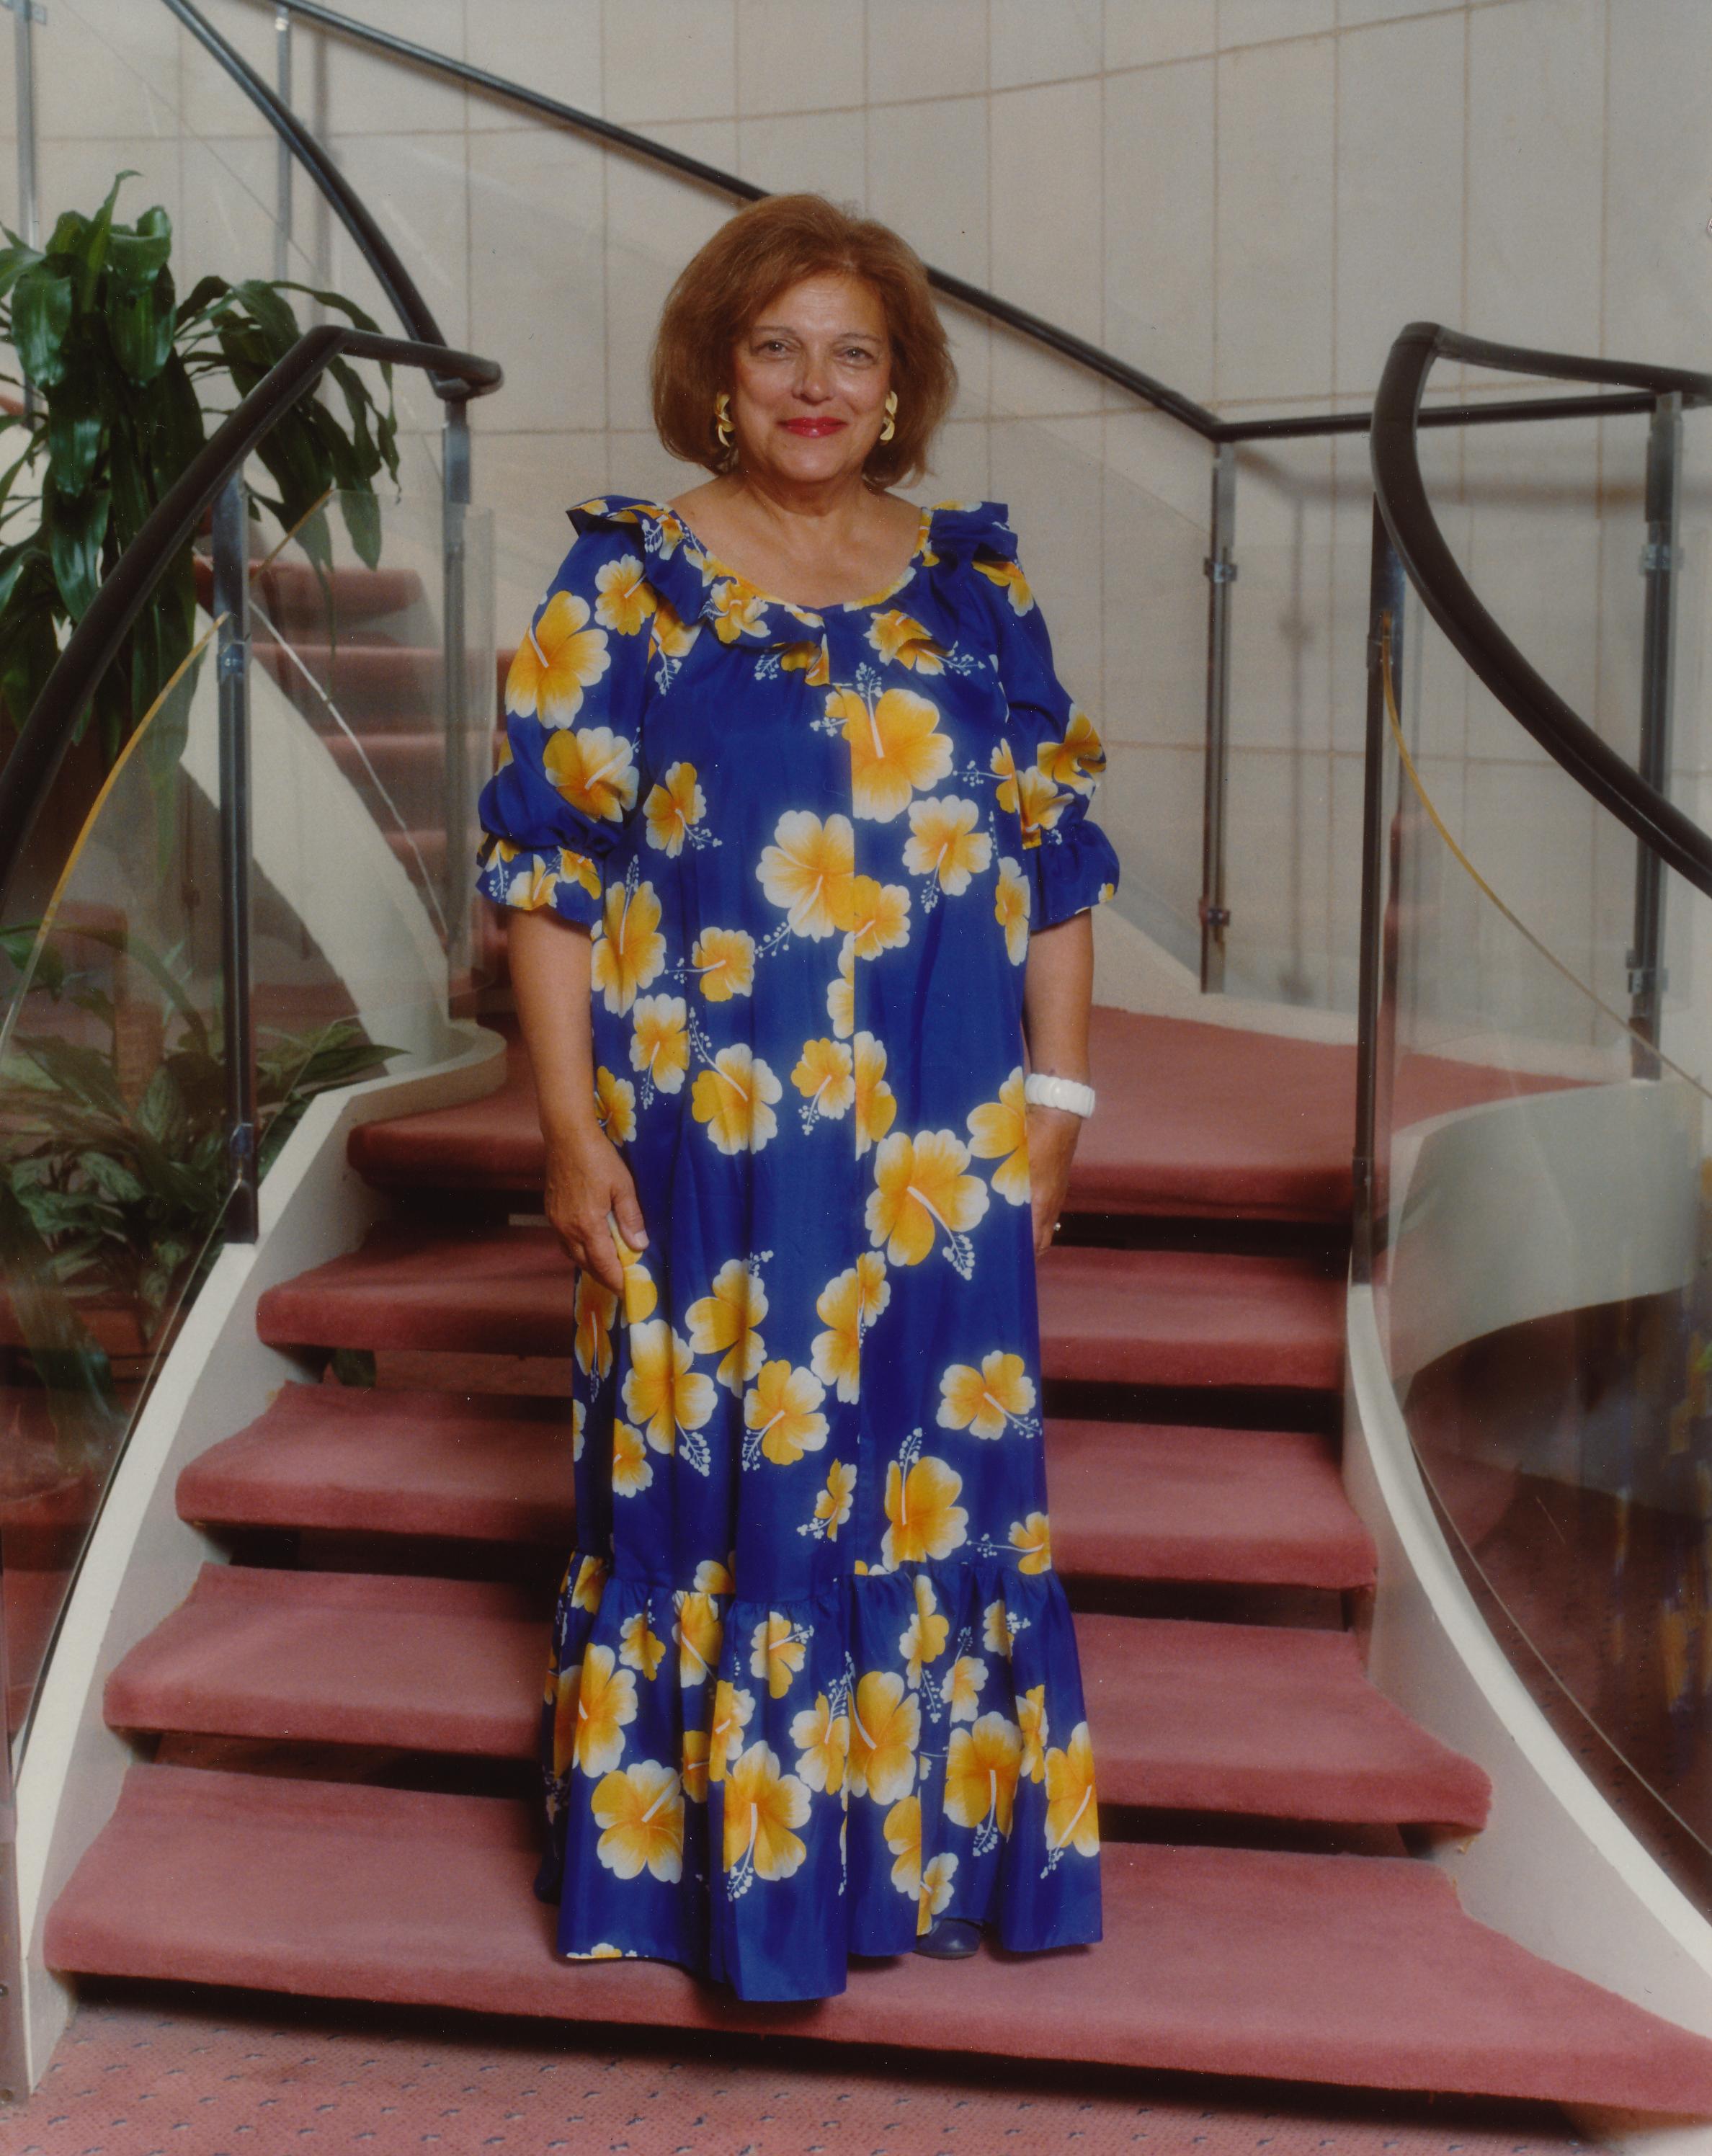 BLS - Cruise (Staircase) - Blue & Yellow Dress.jpeg